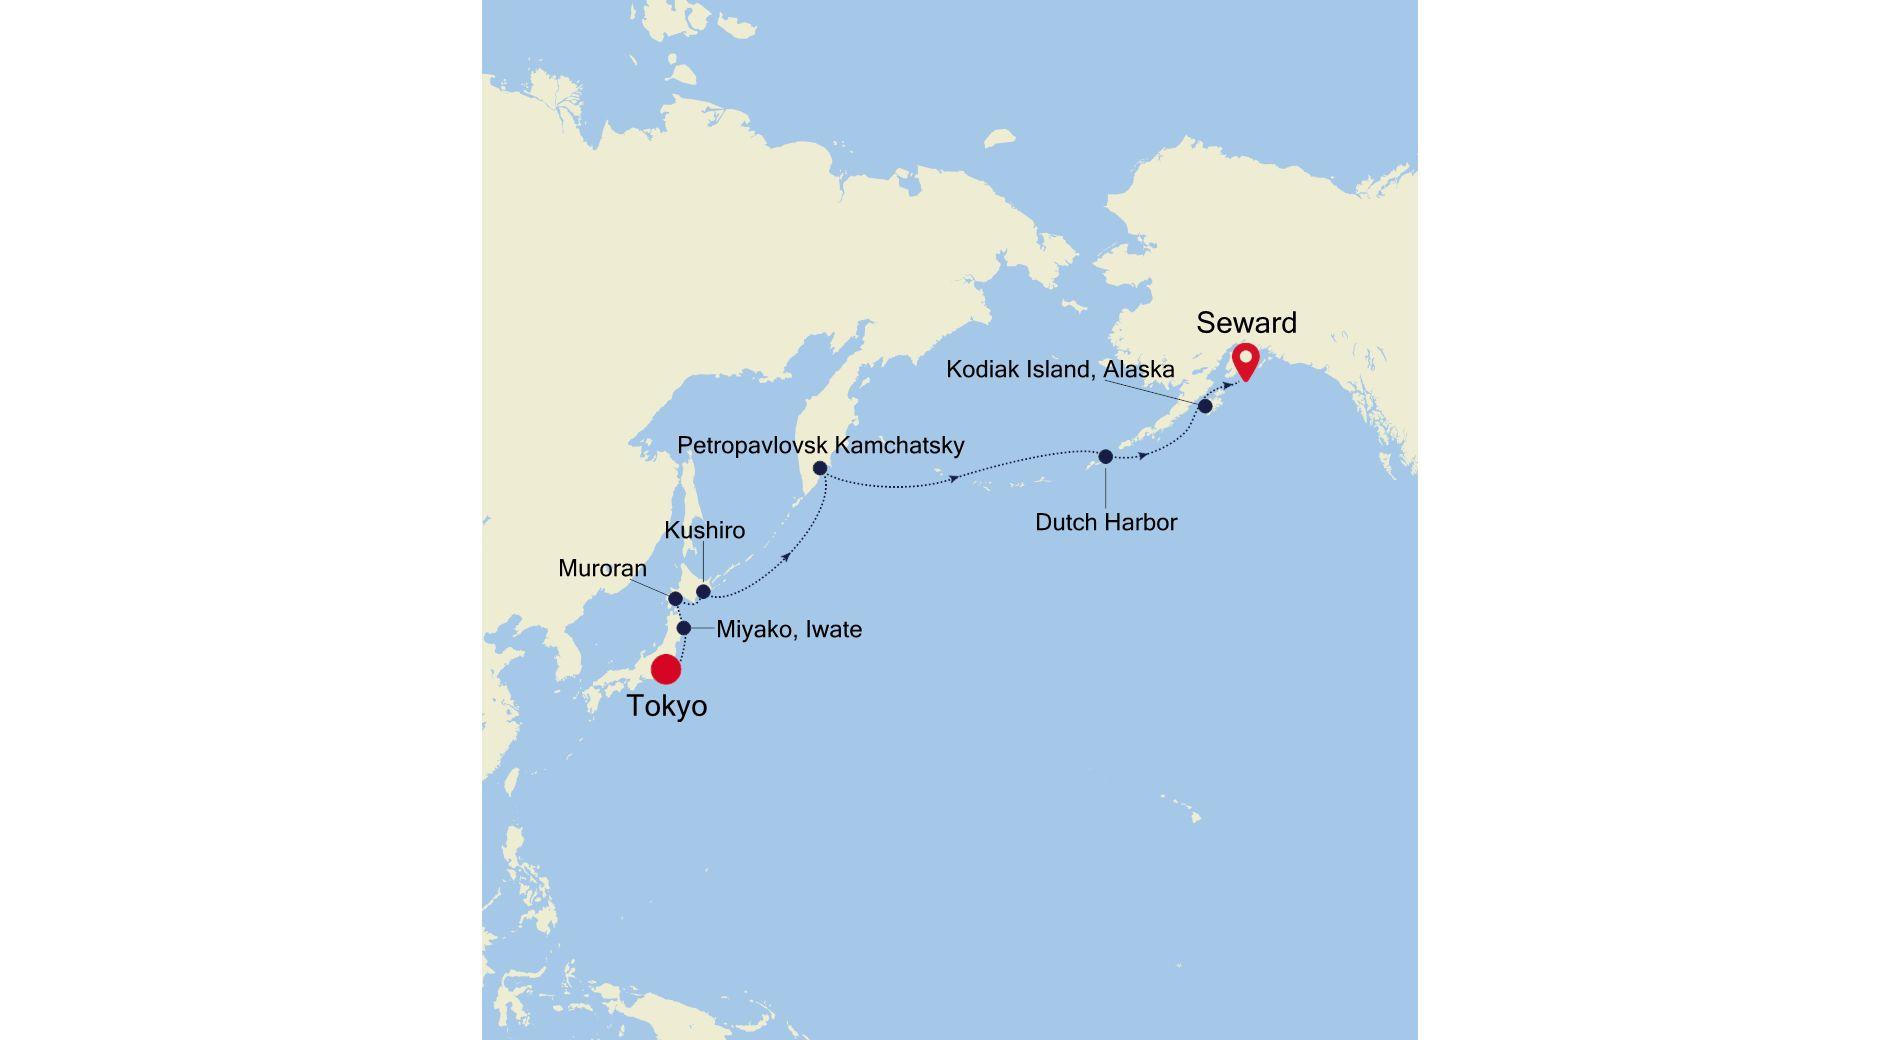 SM220506014 - Tokyo nach Seward (Anchorage